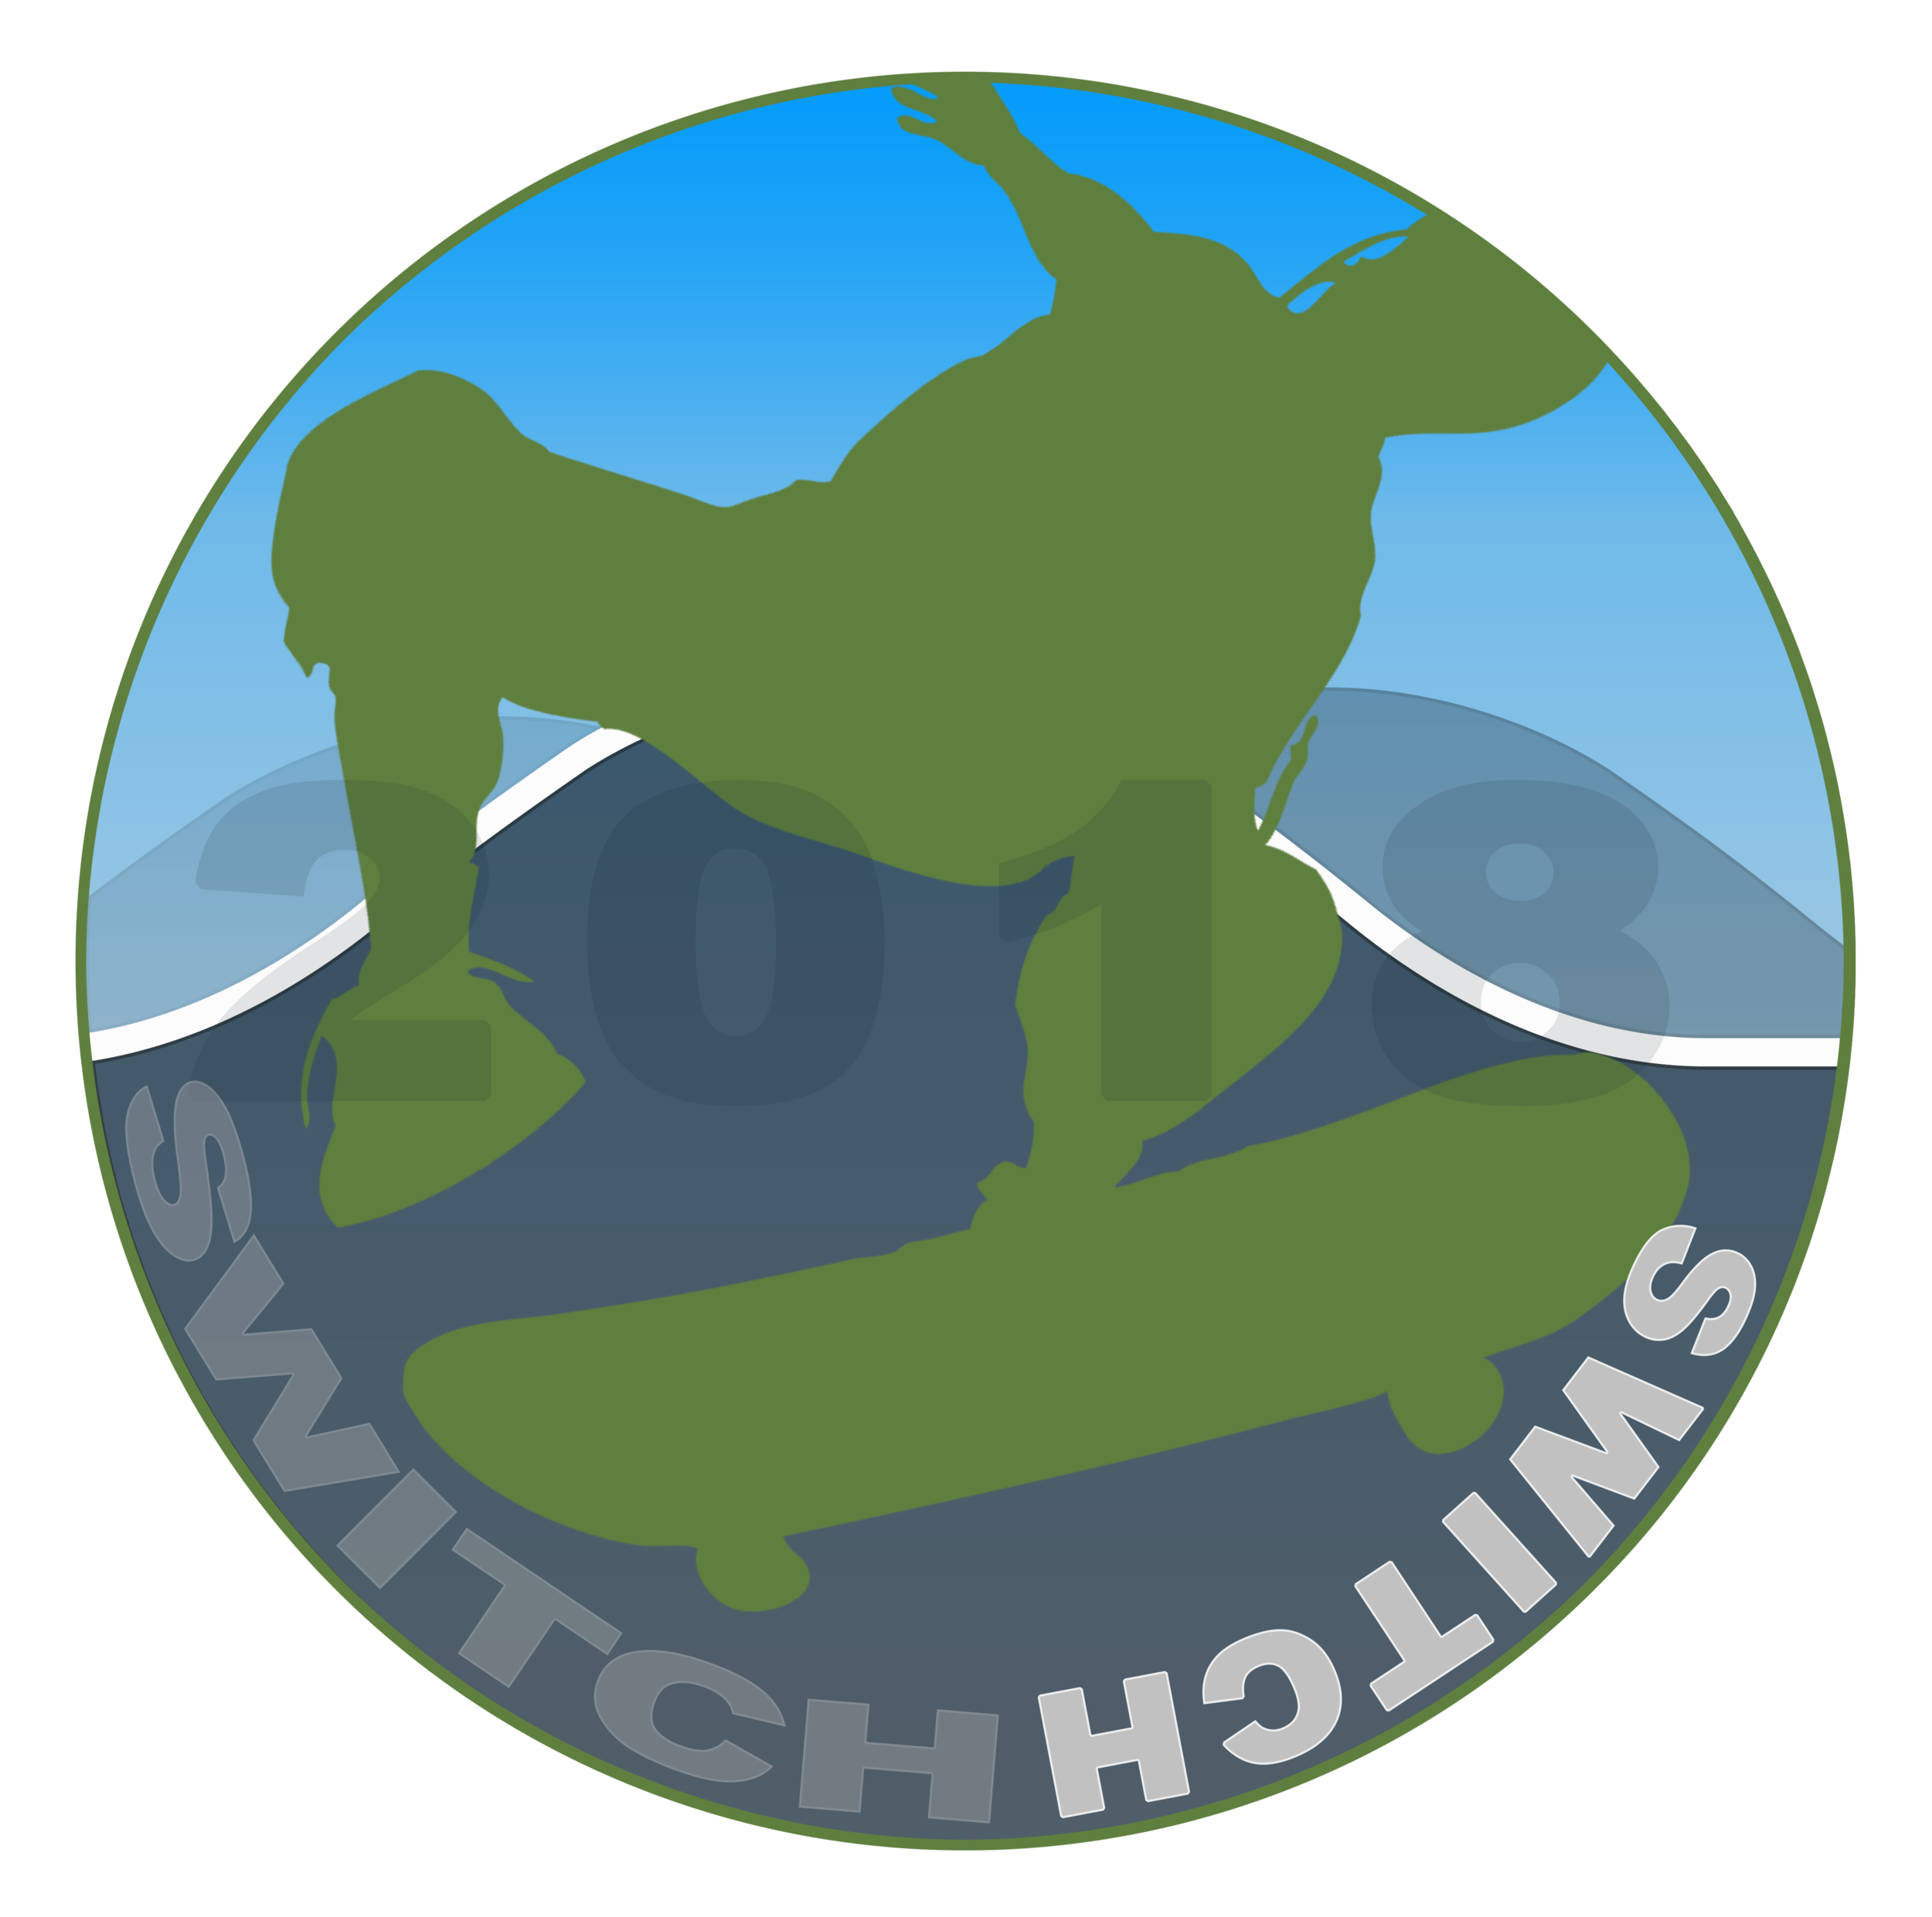 logo supergraphics-greenman III.png